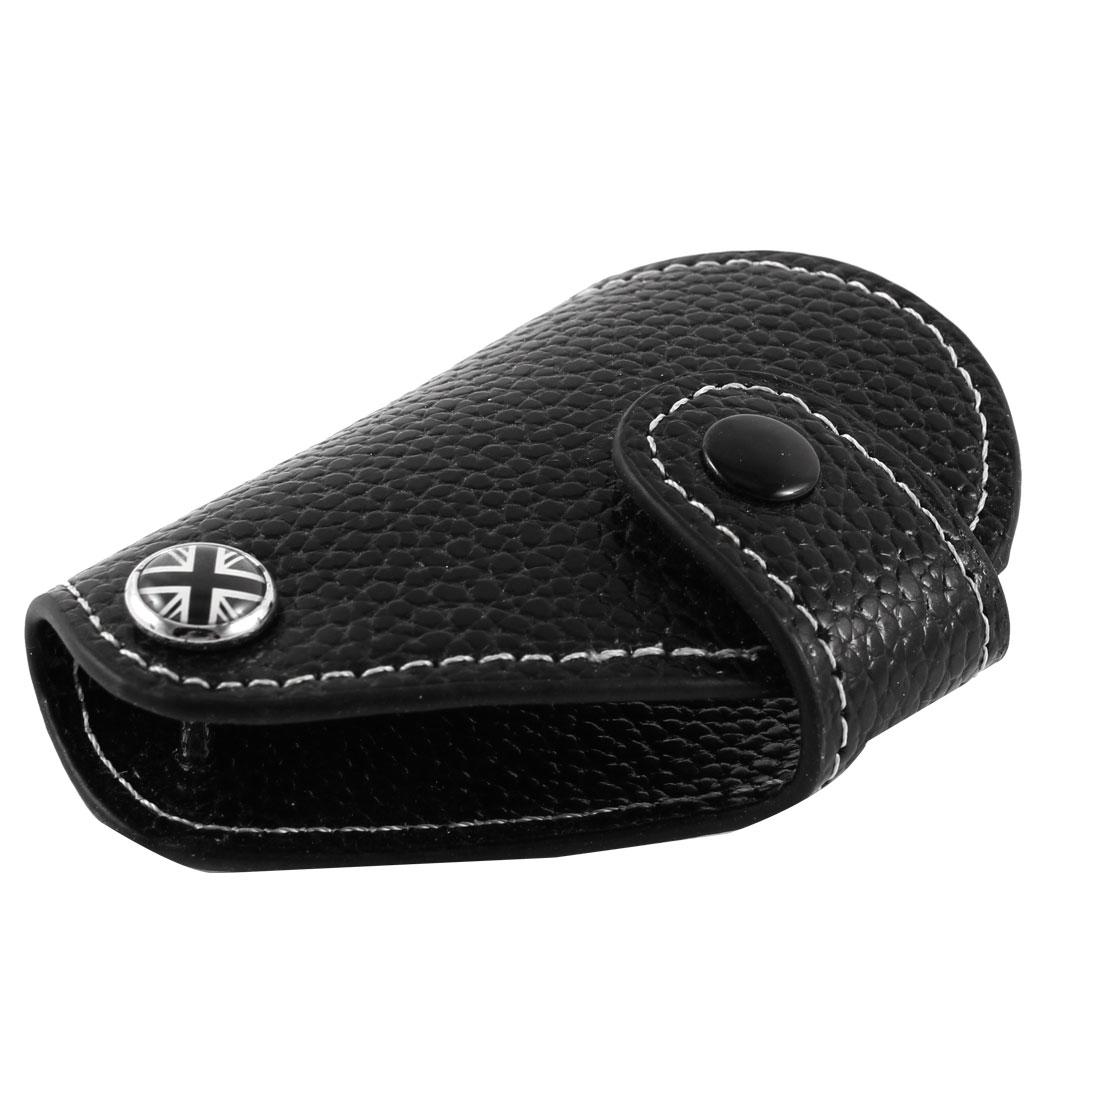 8cm x 6cm Black Union Jack Flag Print Car Key Remote Control Carry Bag for BMW Mini Cooper Countryman